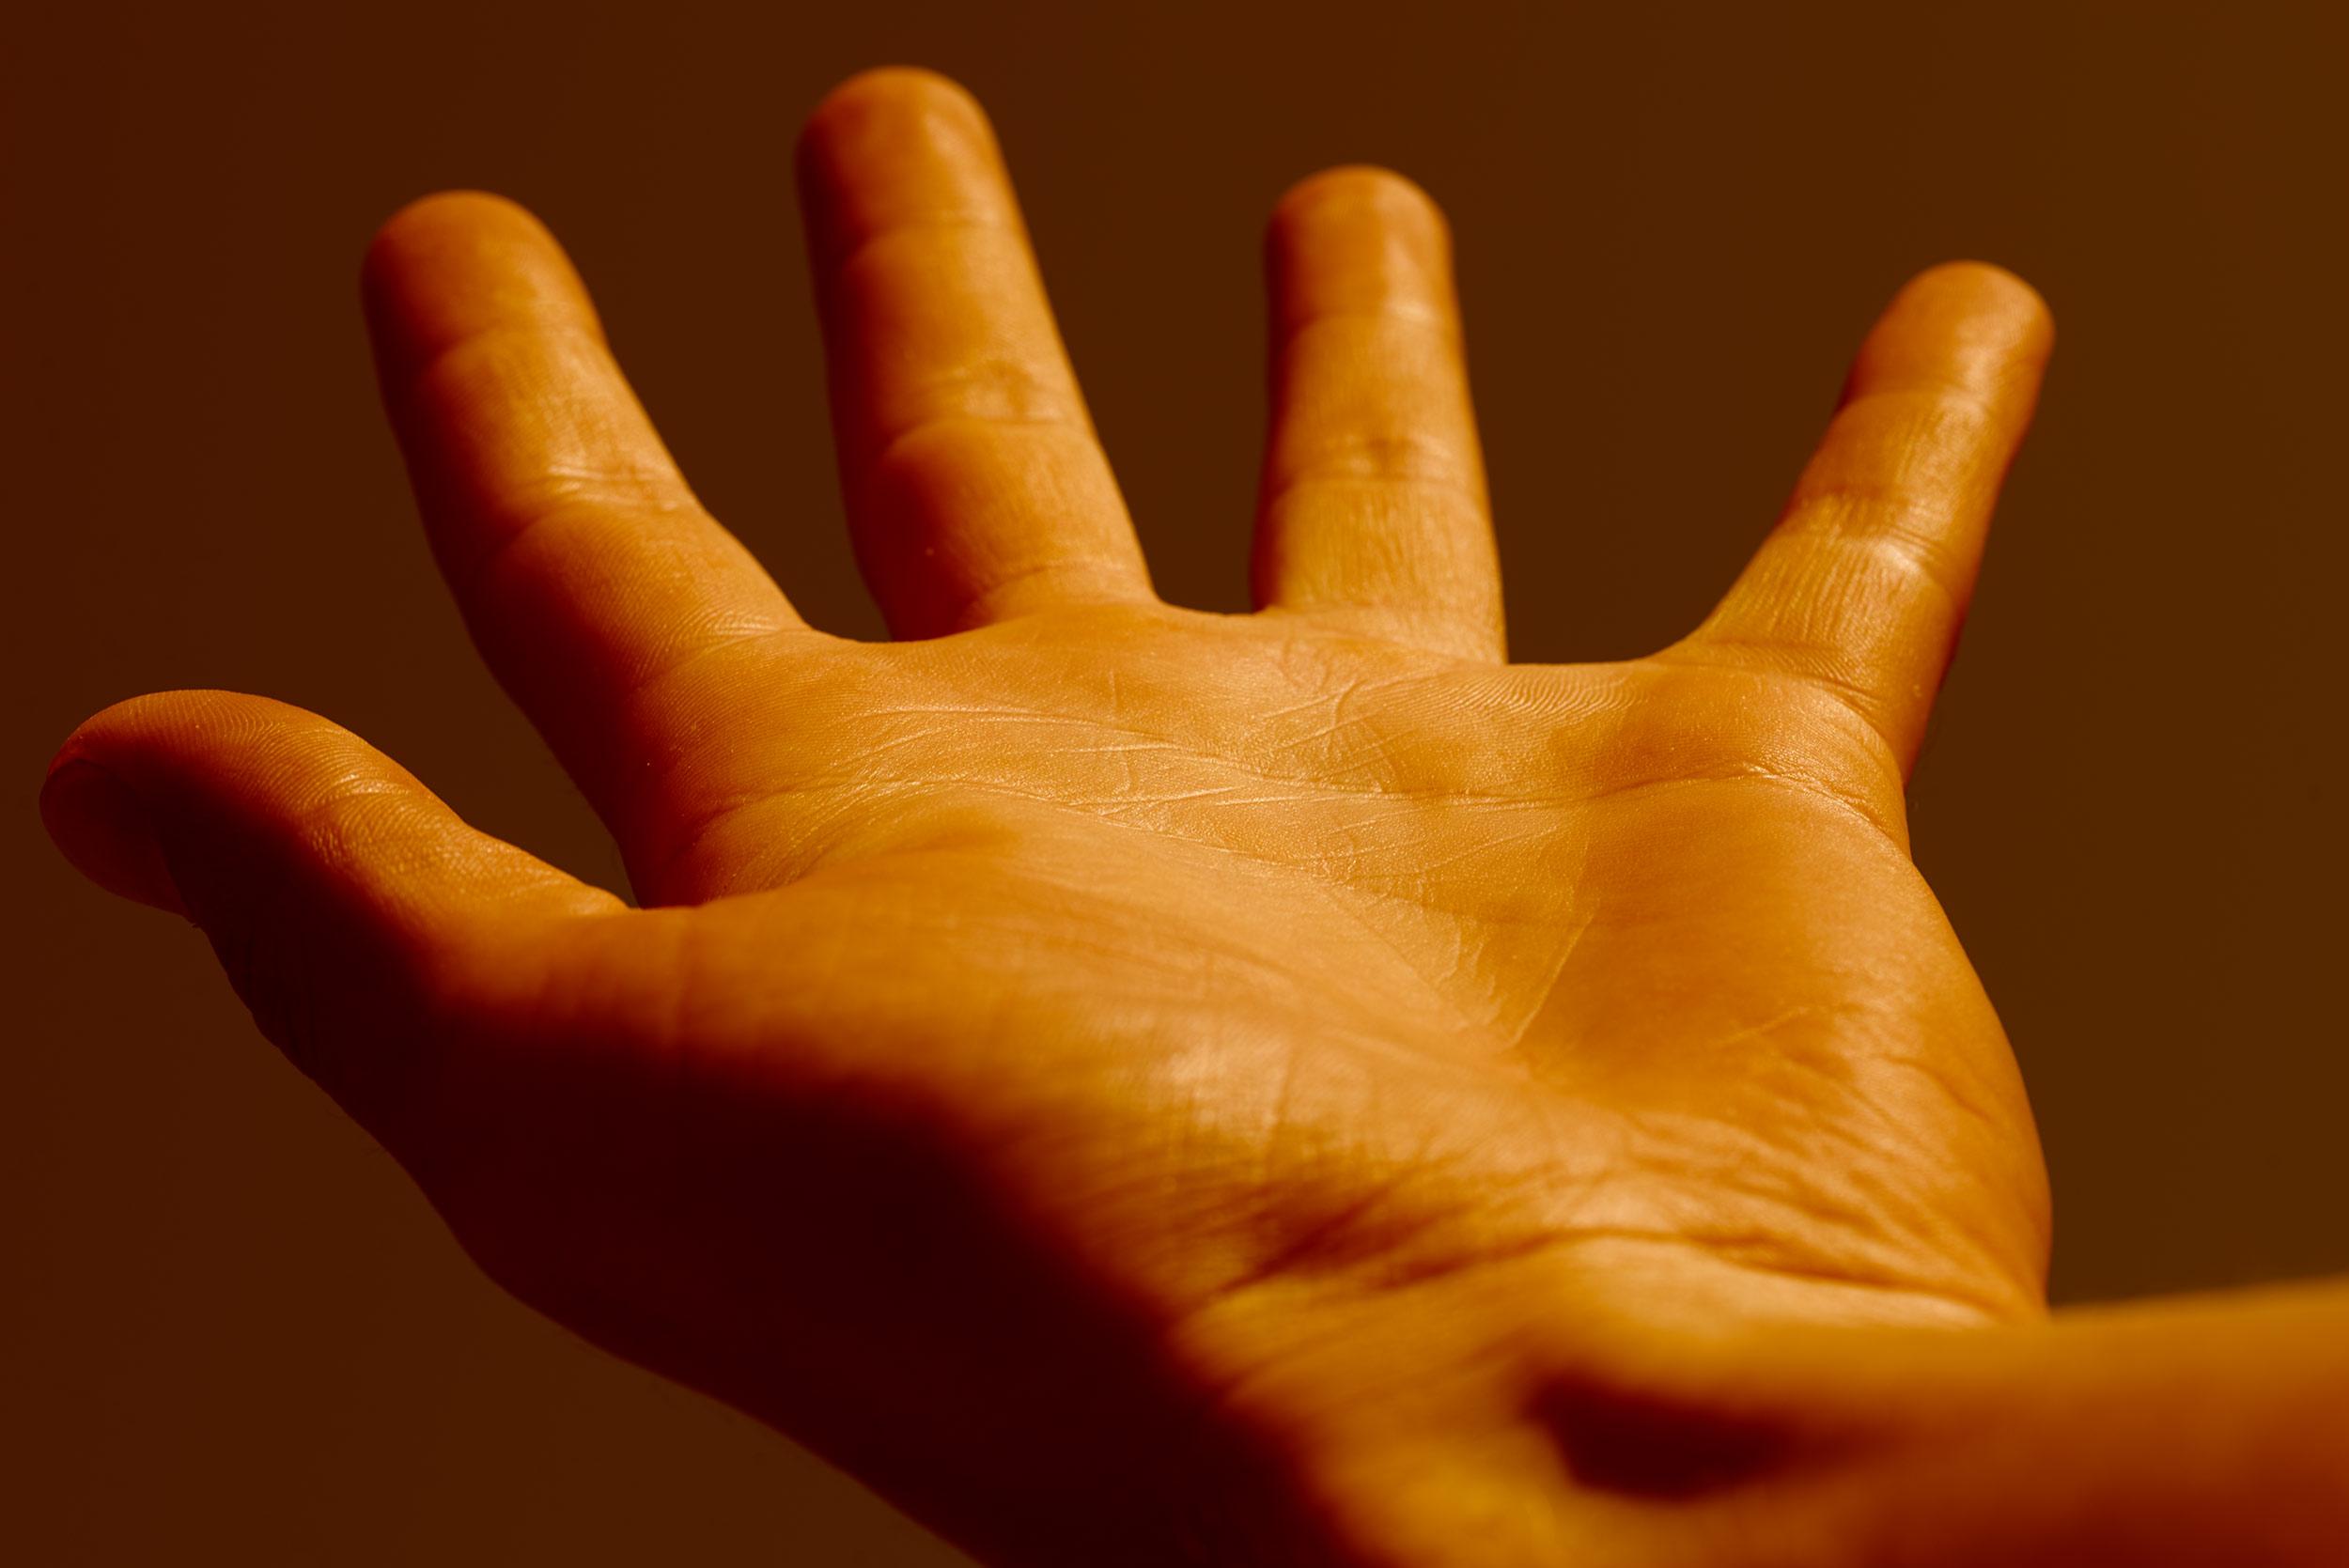 thumb-up-8344.jpg